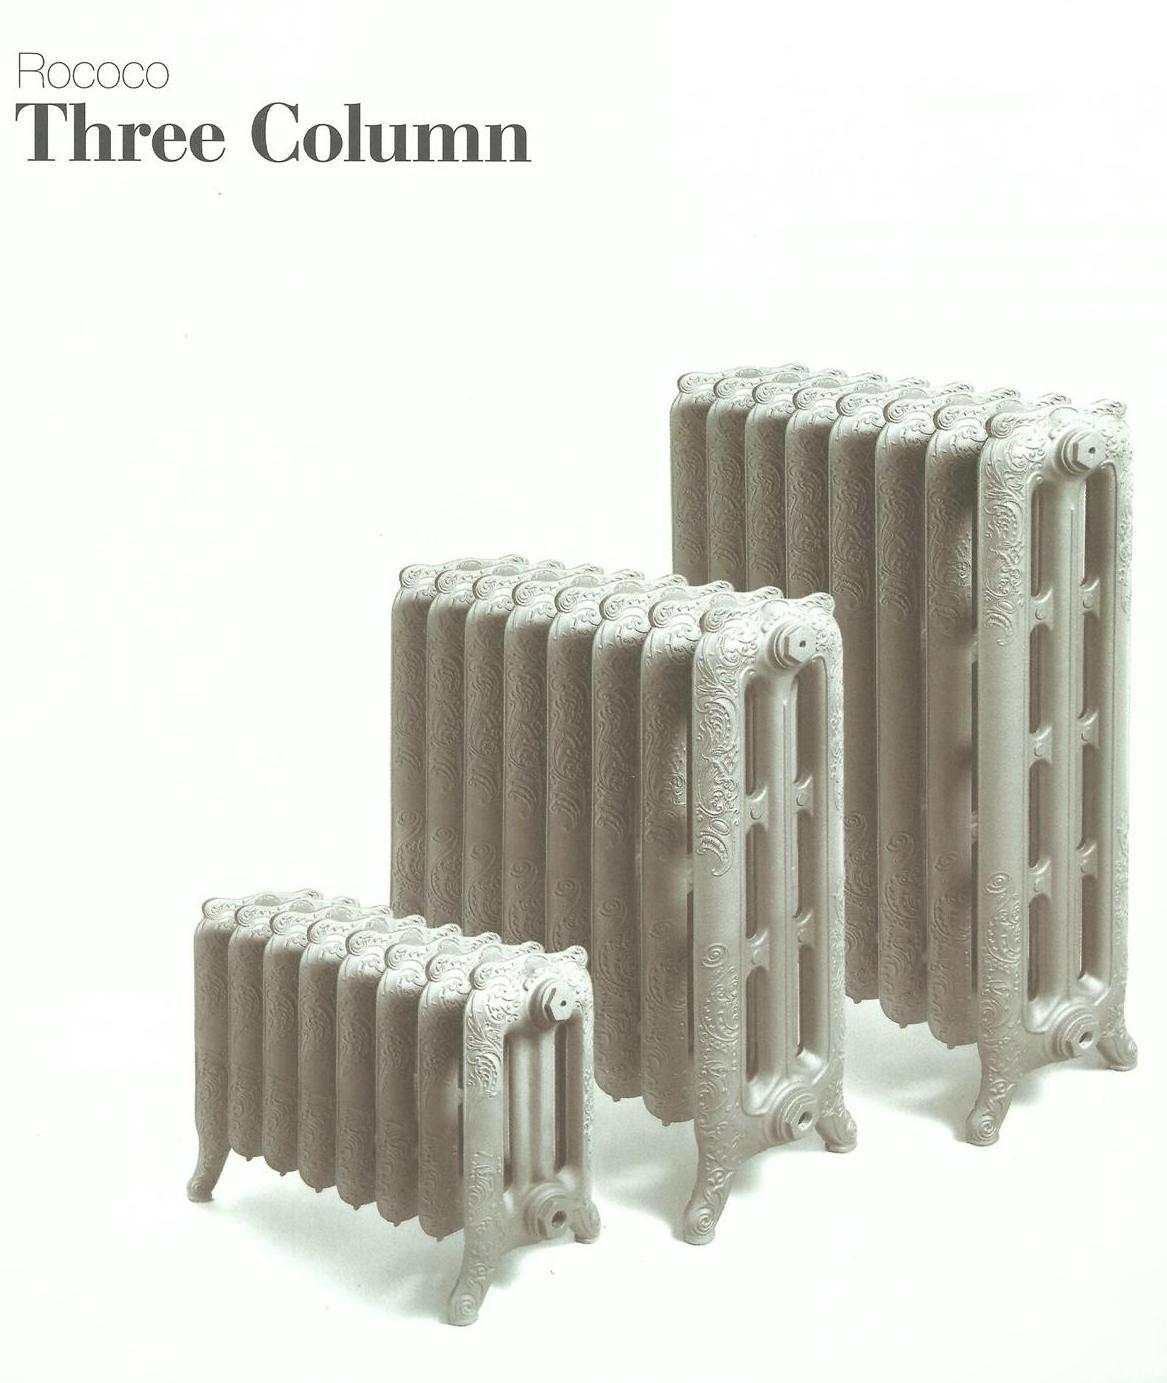 17.012.GH Gusseisenheizelement Three Column